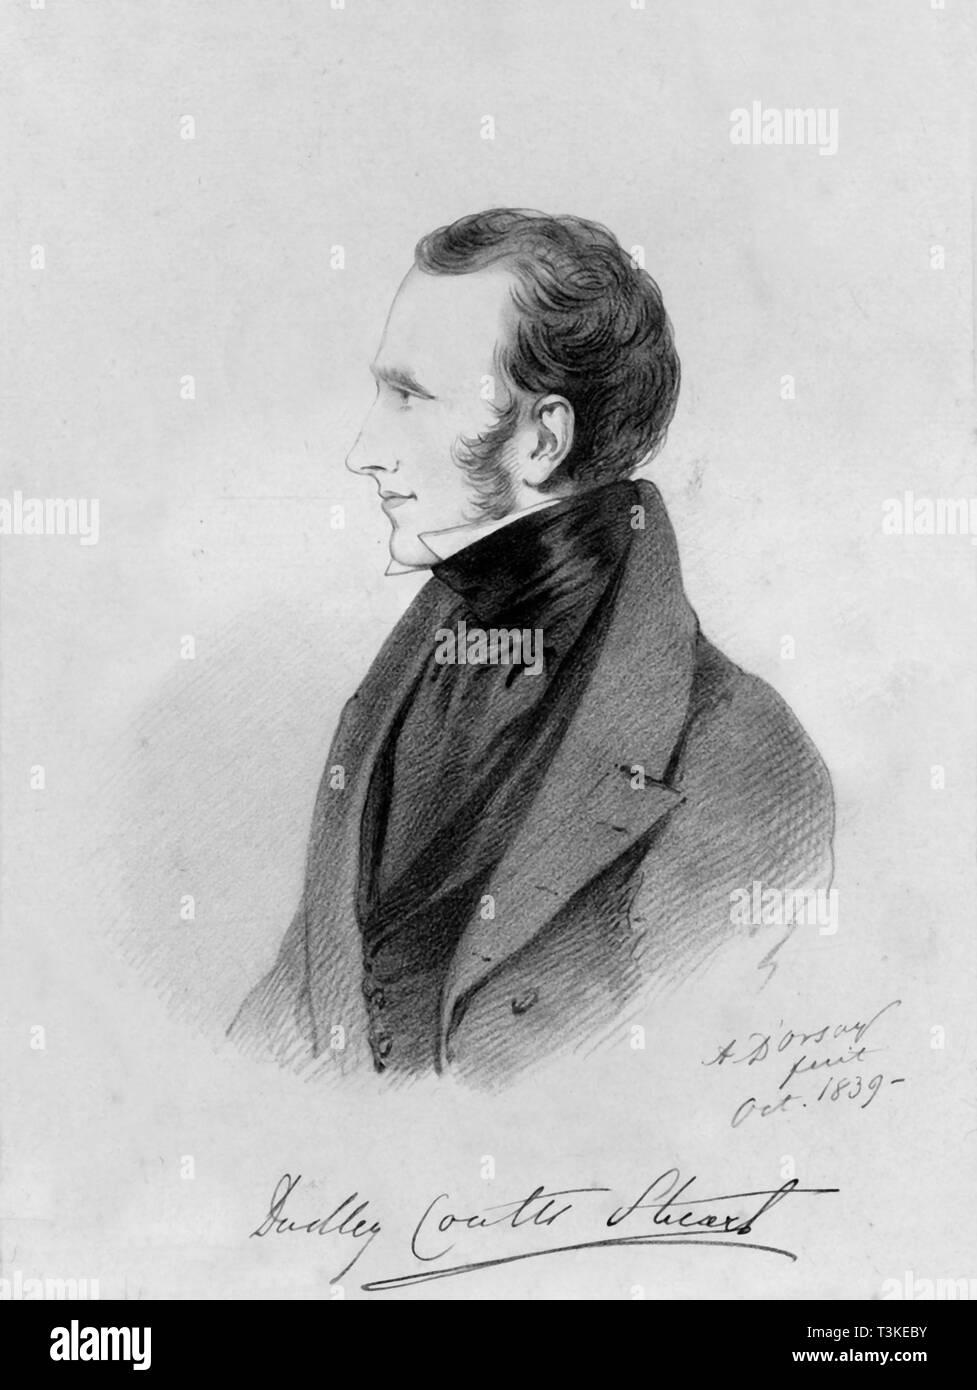 'Dudley Coutts Stuart', 1839. Creators: Alfred d'Orsay, Richard James Lane. - Stock Image